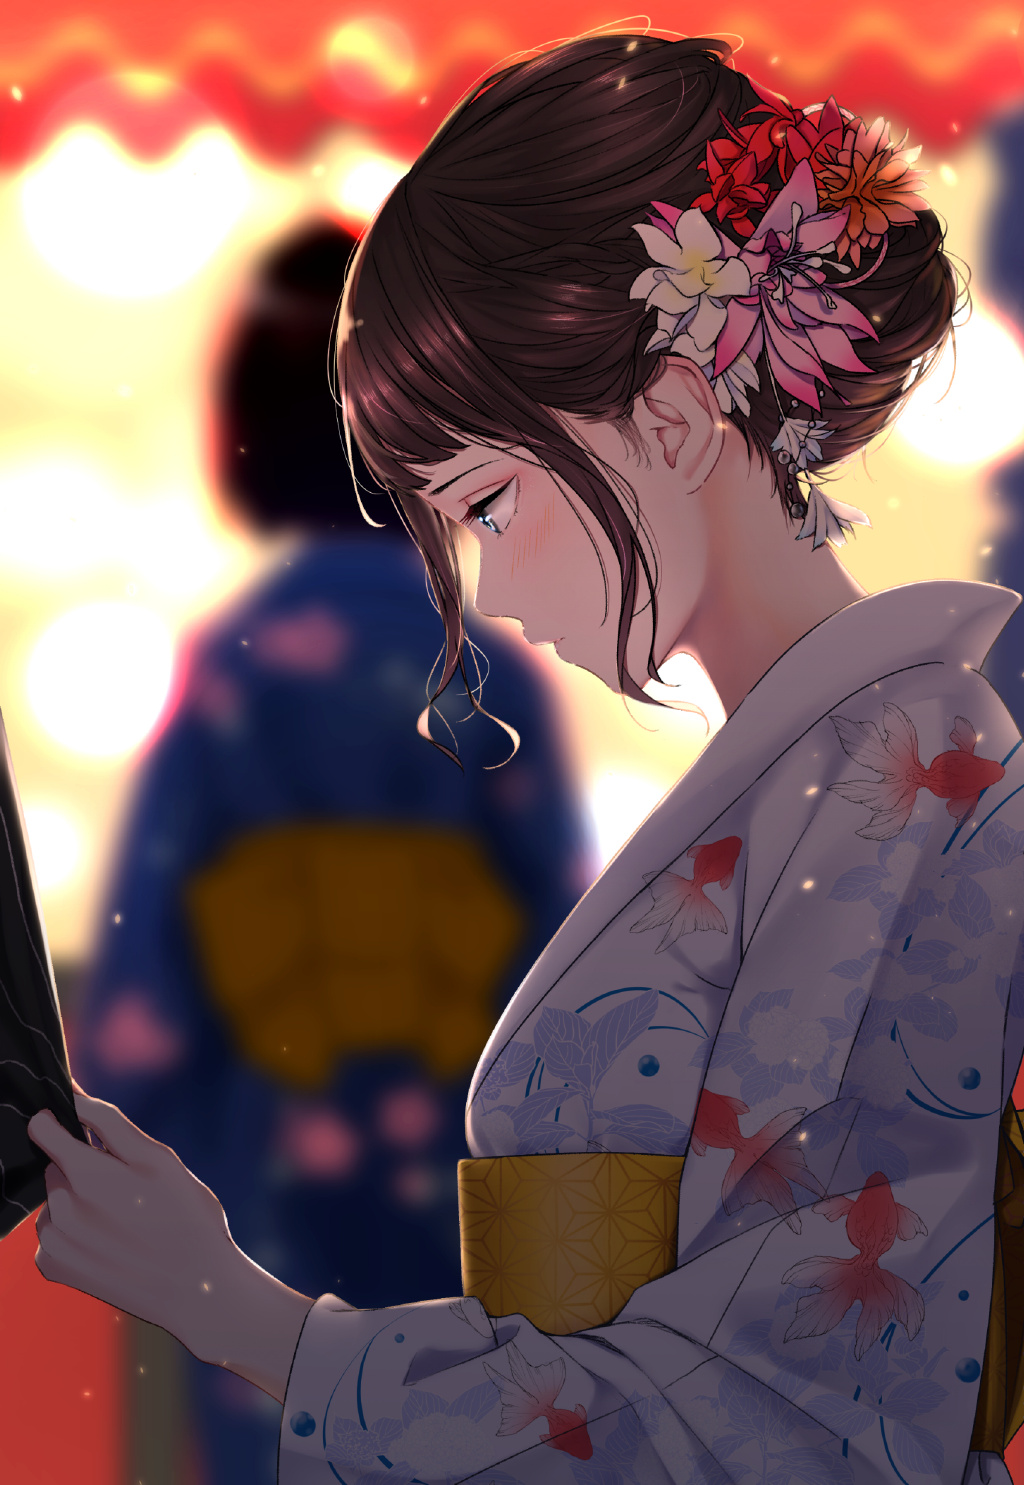 P站精选&黑丝、泪痣与眼镜娘!日本画师サイトー的插画作品-Zhaiuu.Com-宅尤尤